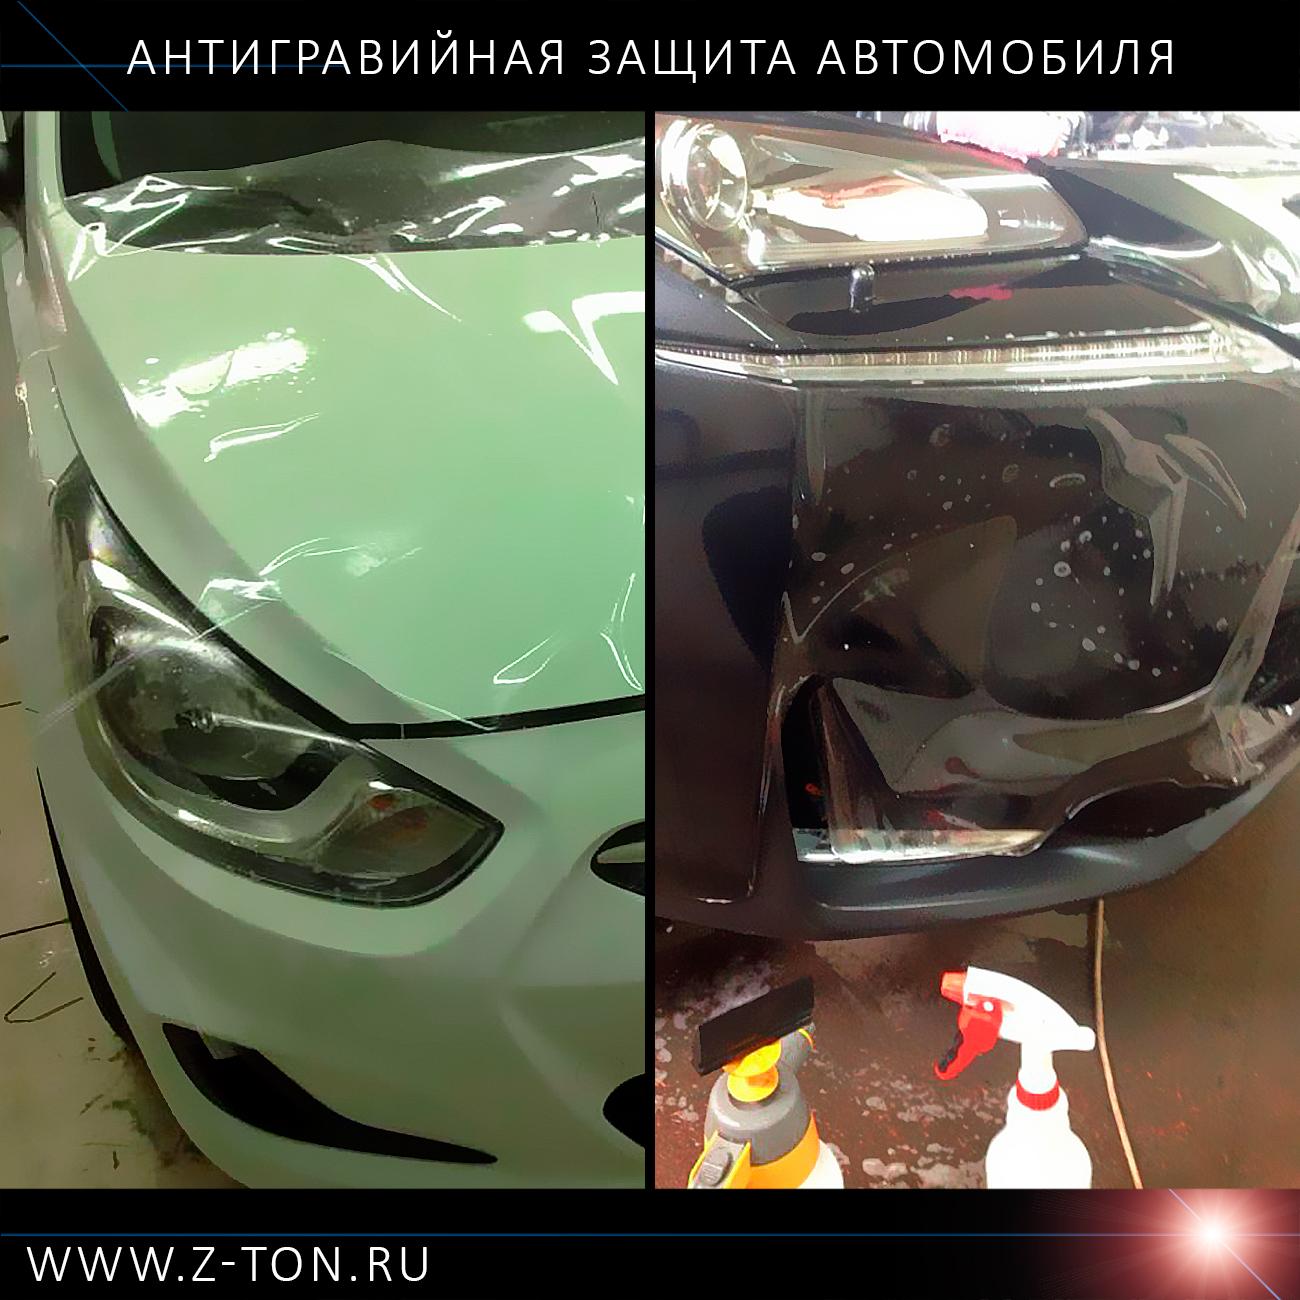 Антигравийная защита автомобиля в Зеленограде